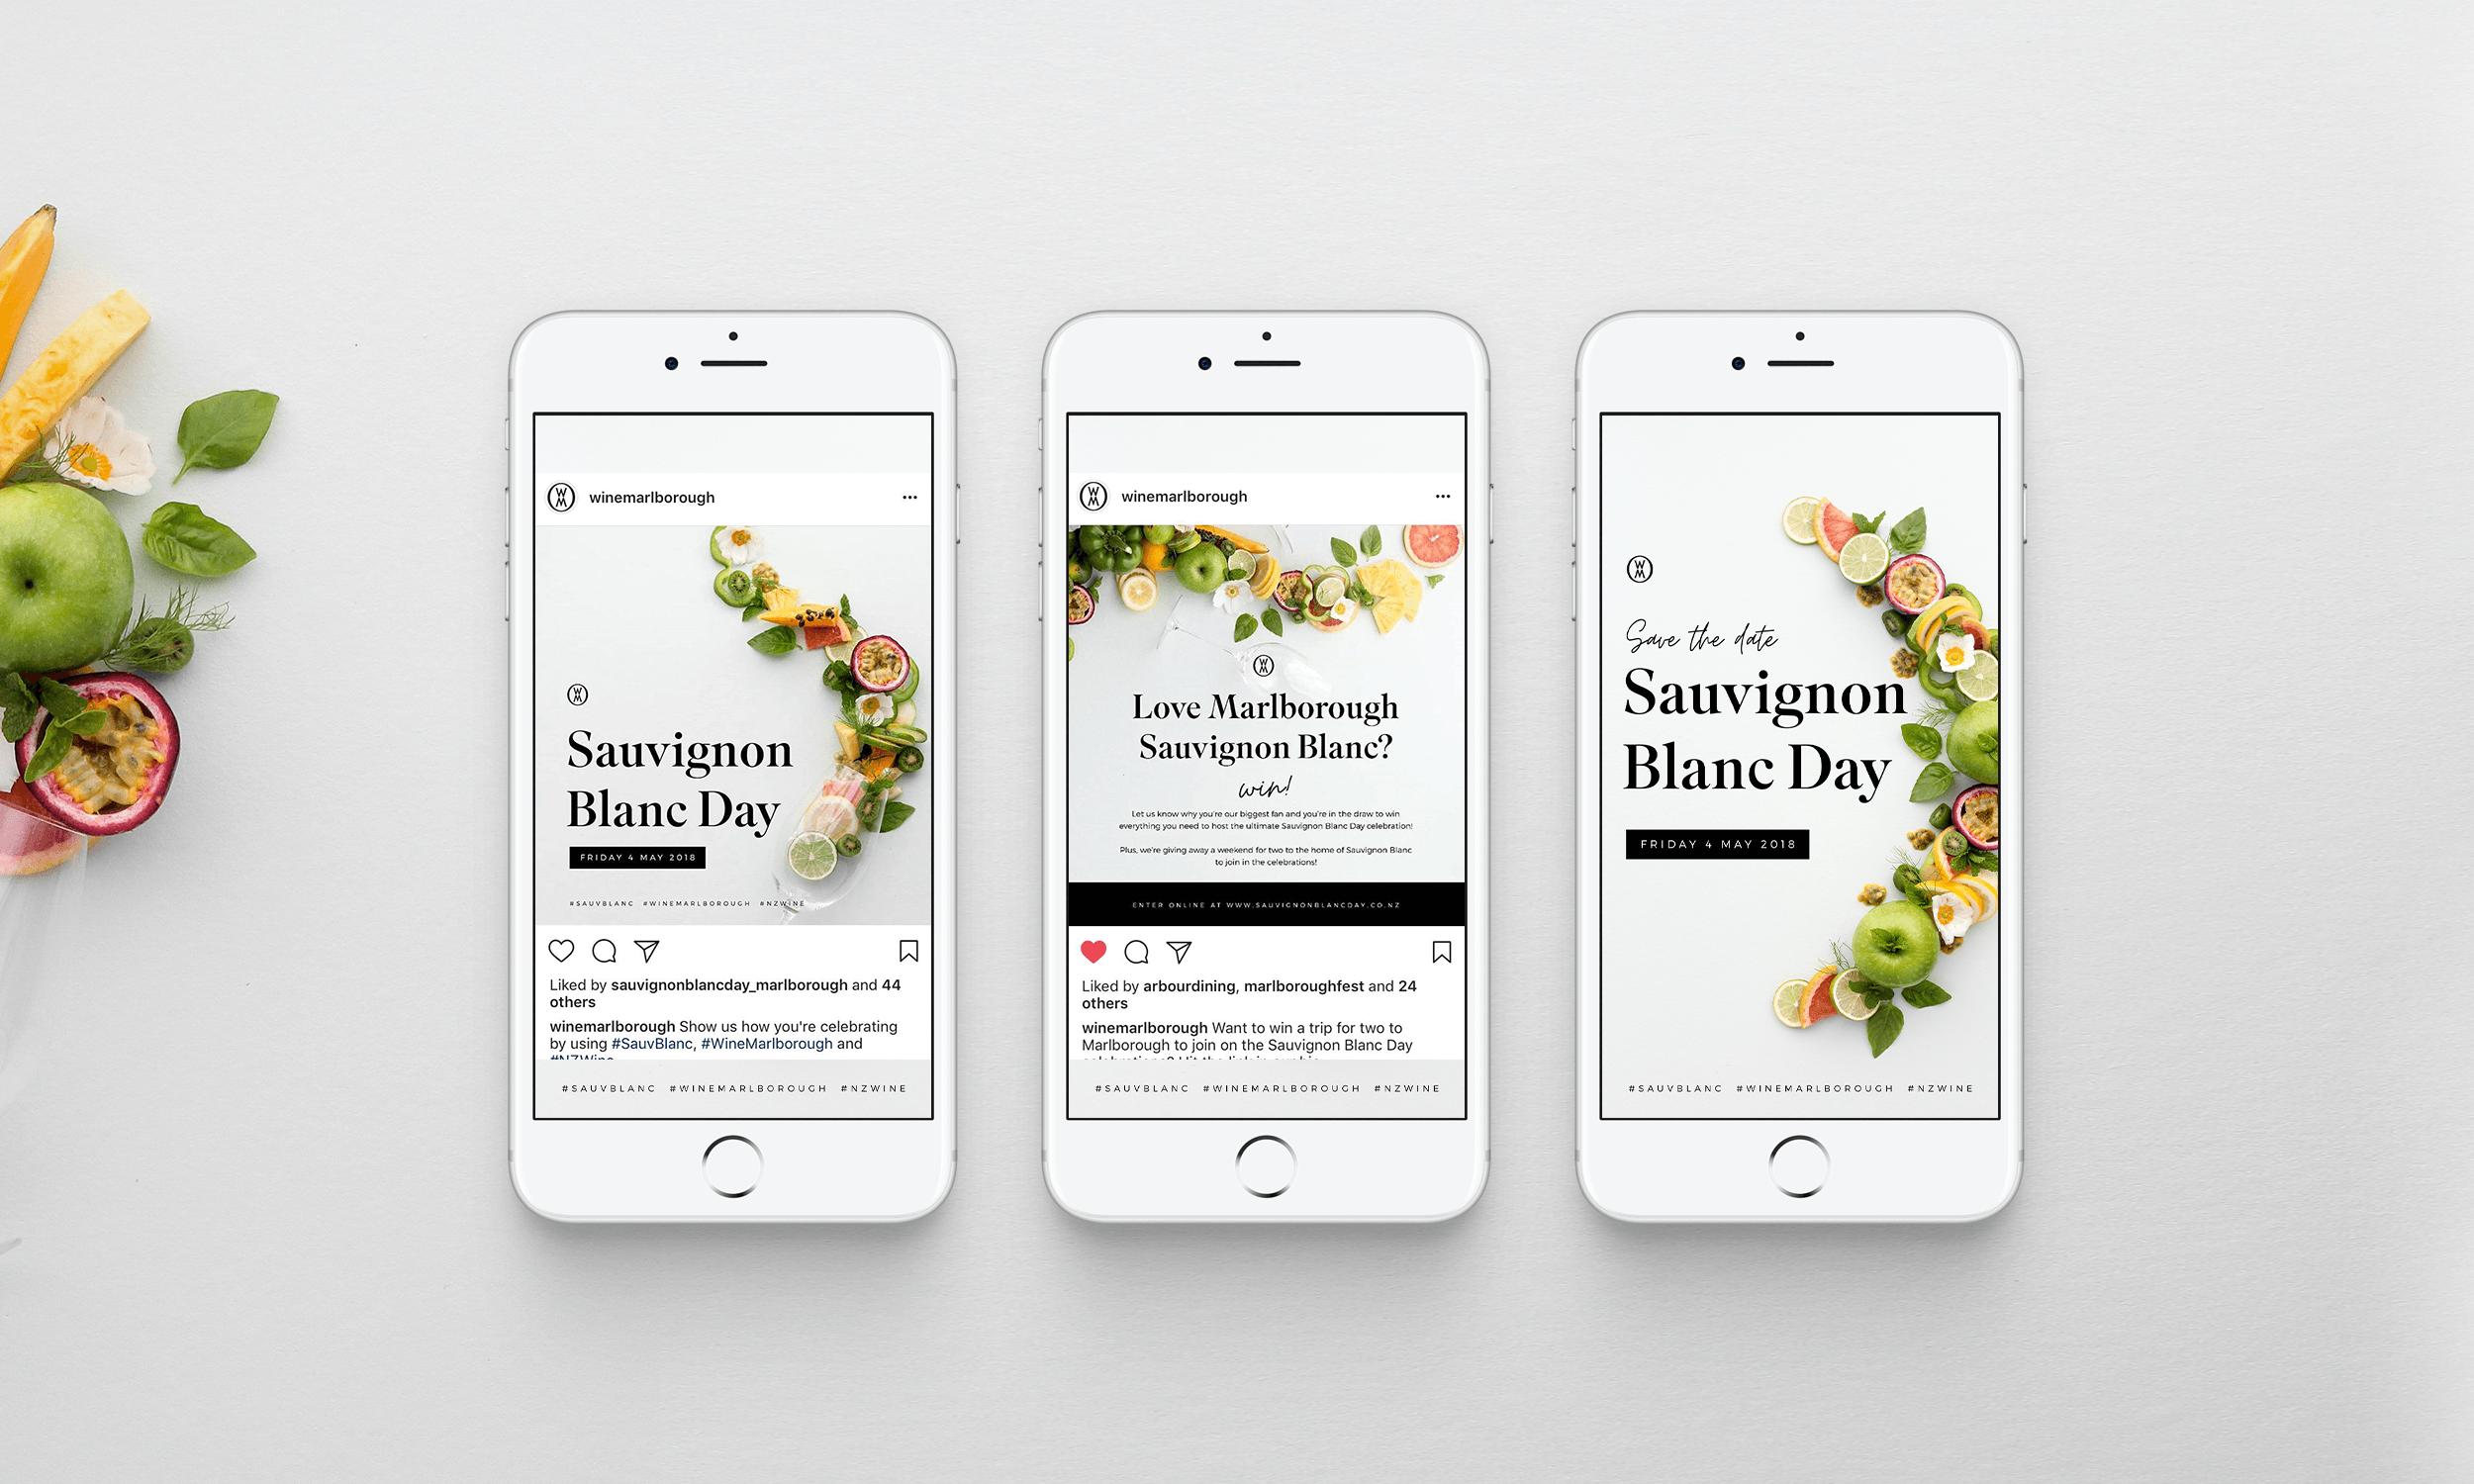 Sauv Blanc Day 2018 - January Made Design